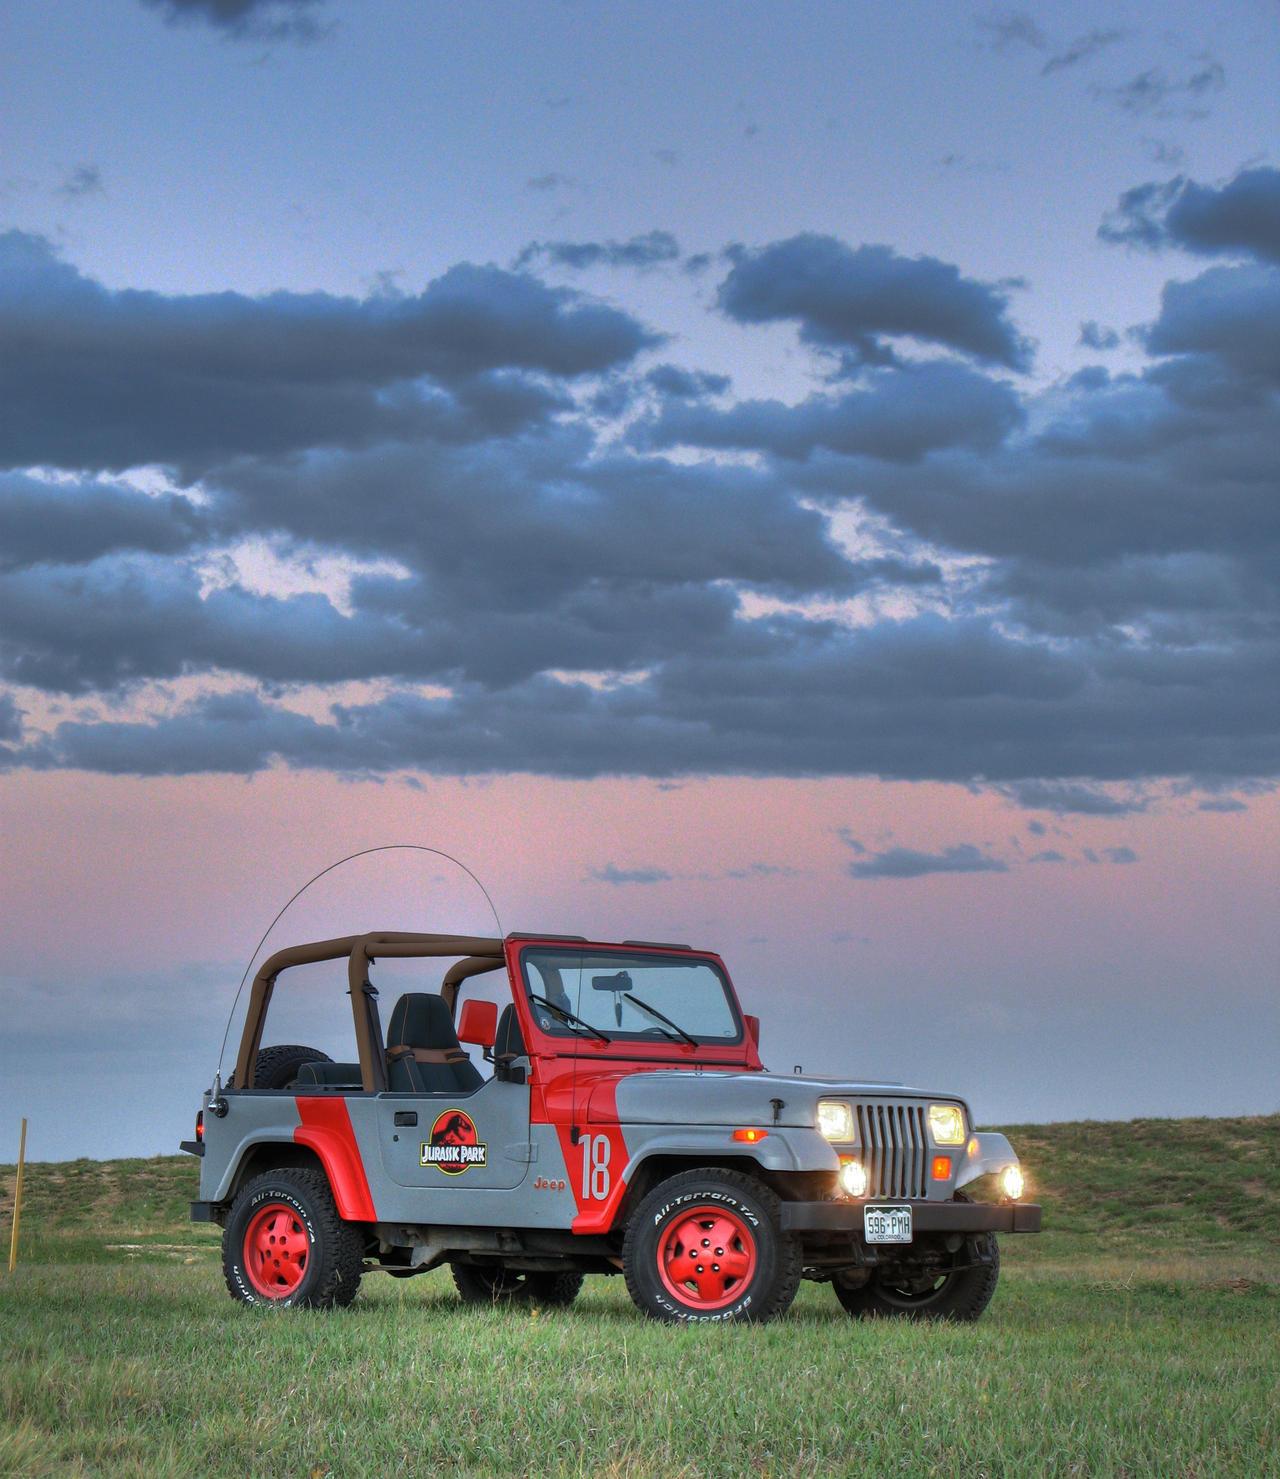 Jurassic Park Jeep Wrangler 23 by Boomerjinks